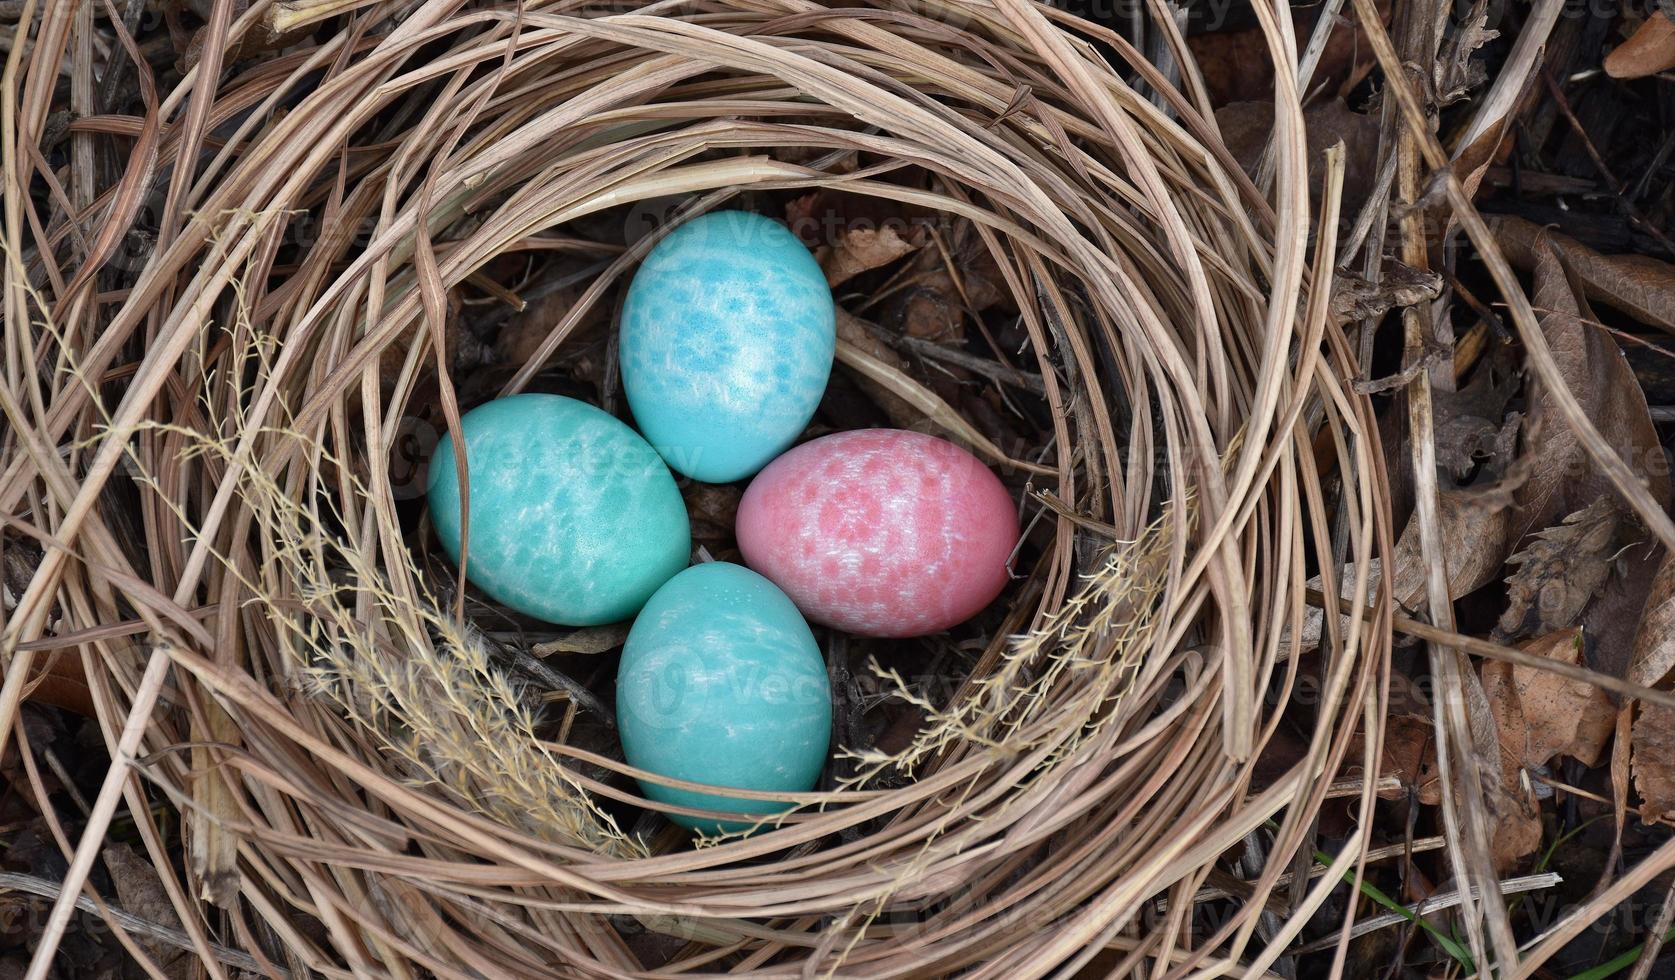 cuarteto de huevos de pascua foto